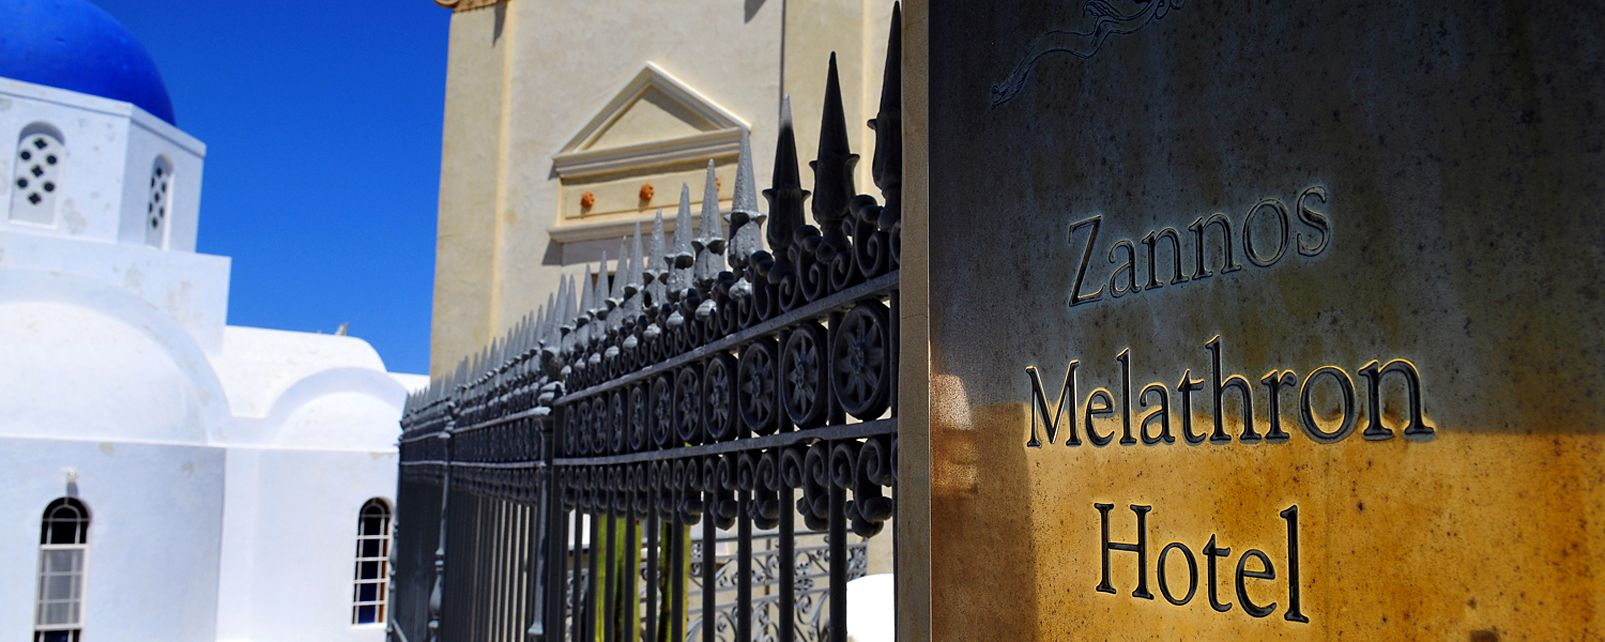 Hôtel Zannos Melathron